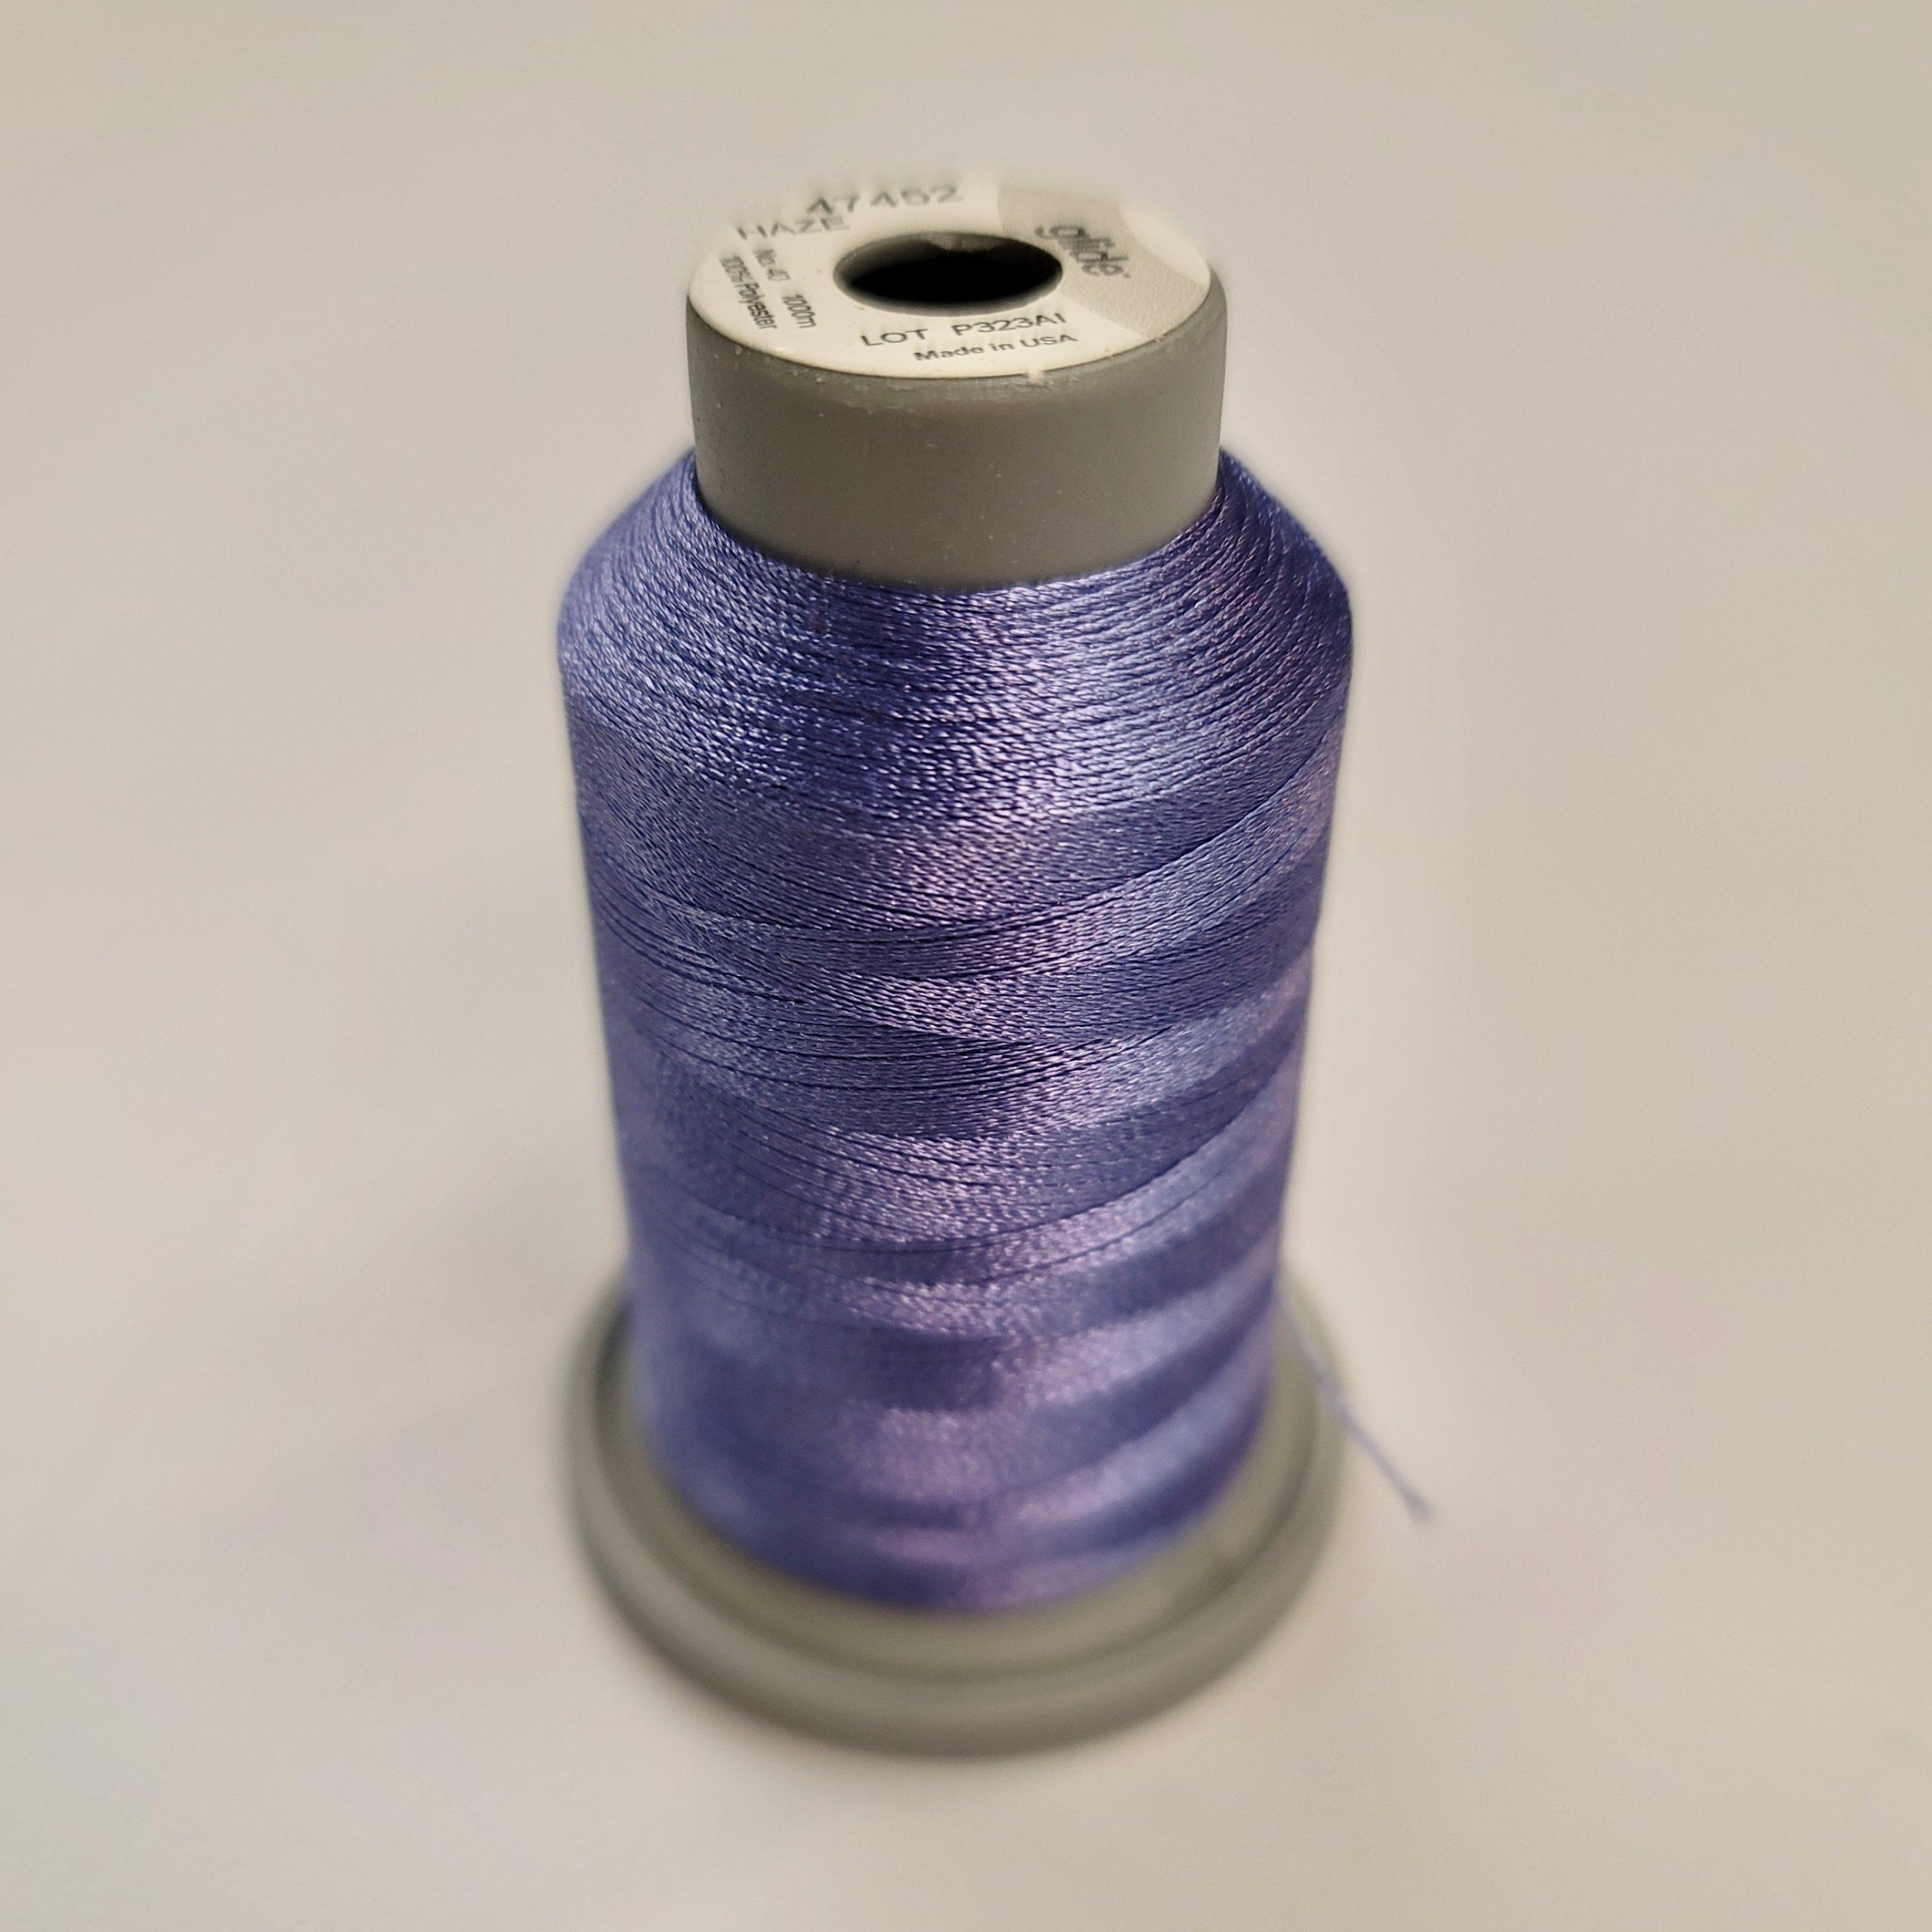 haze purple glide thread spool